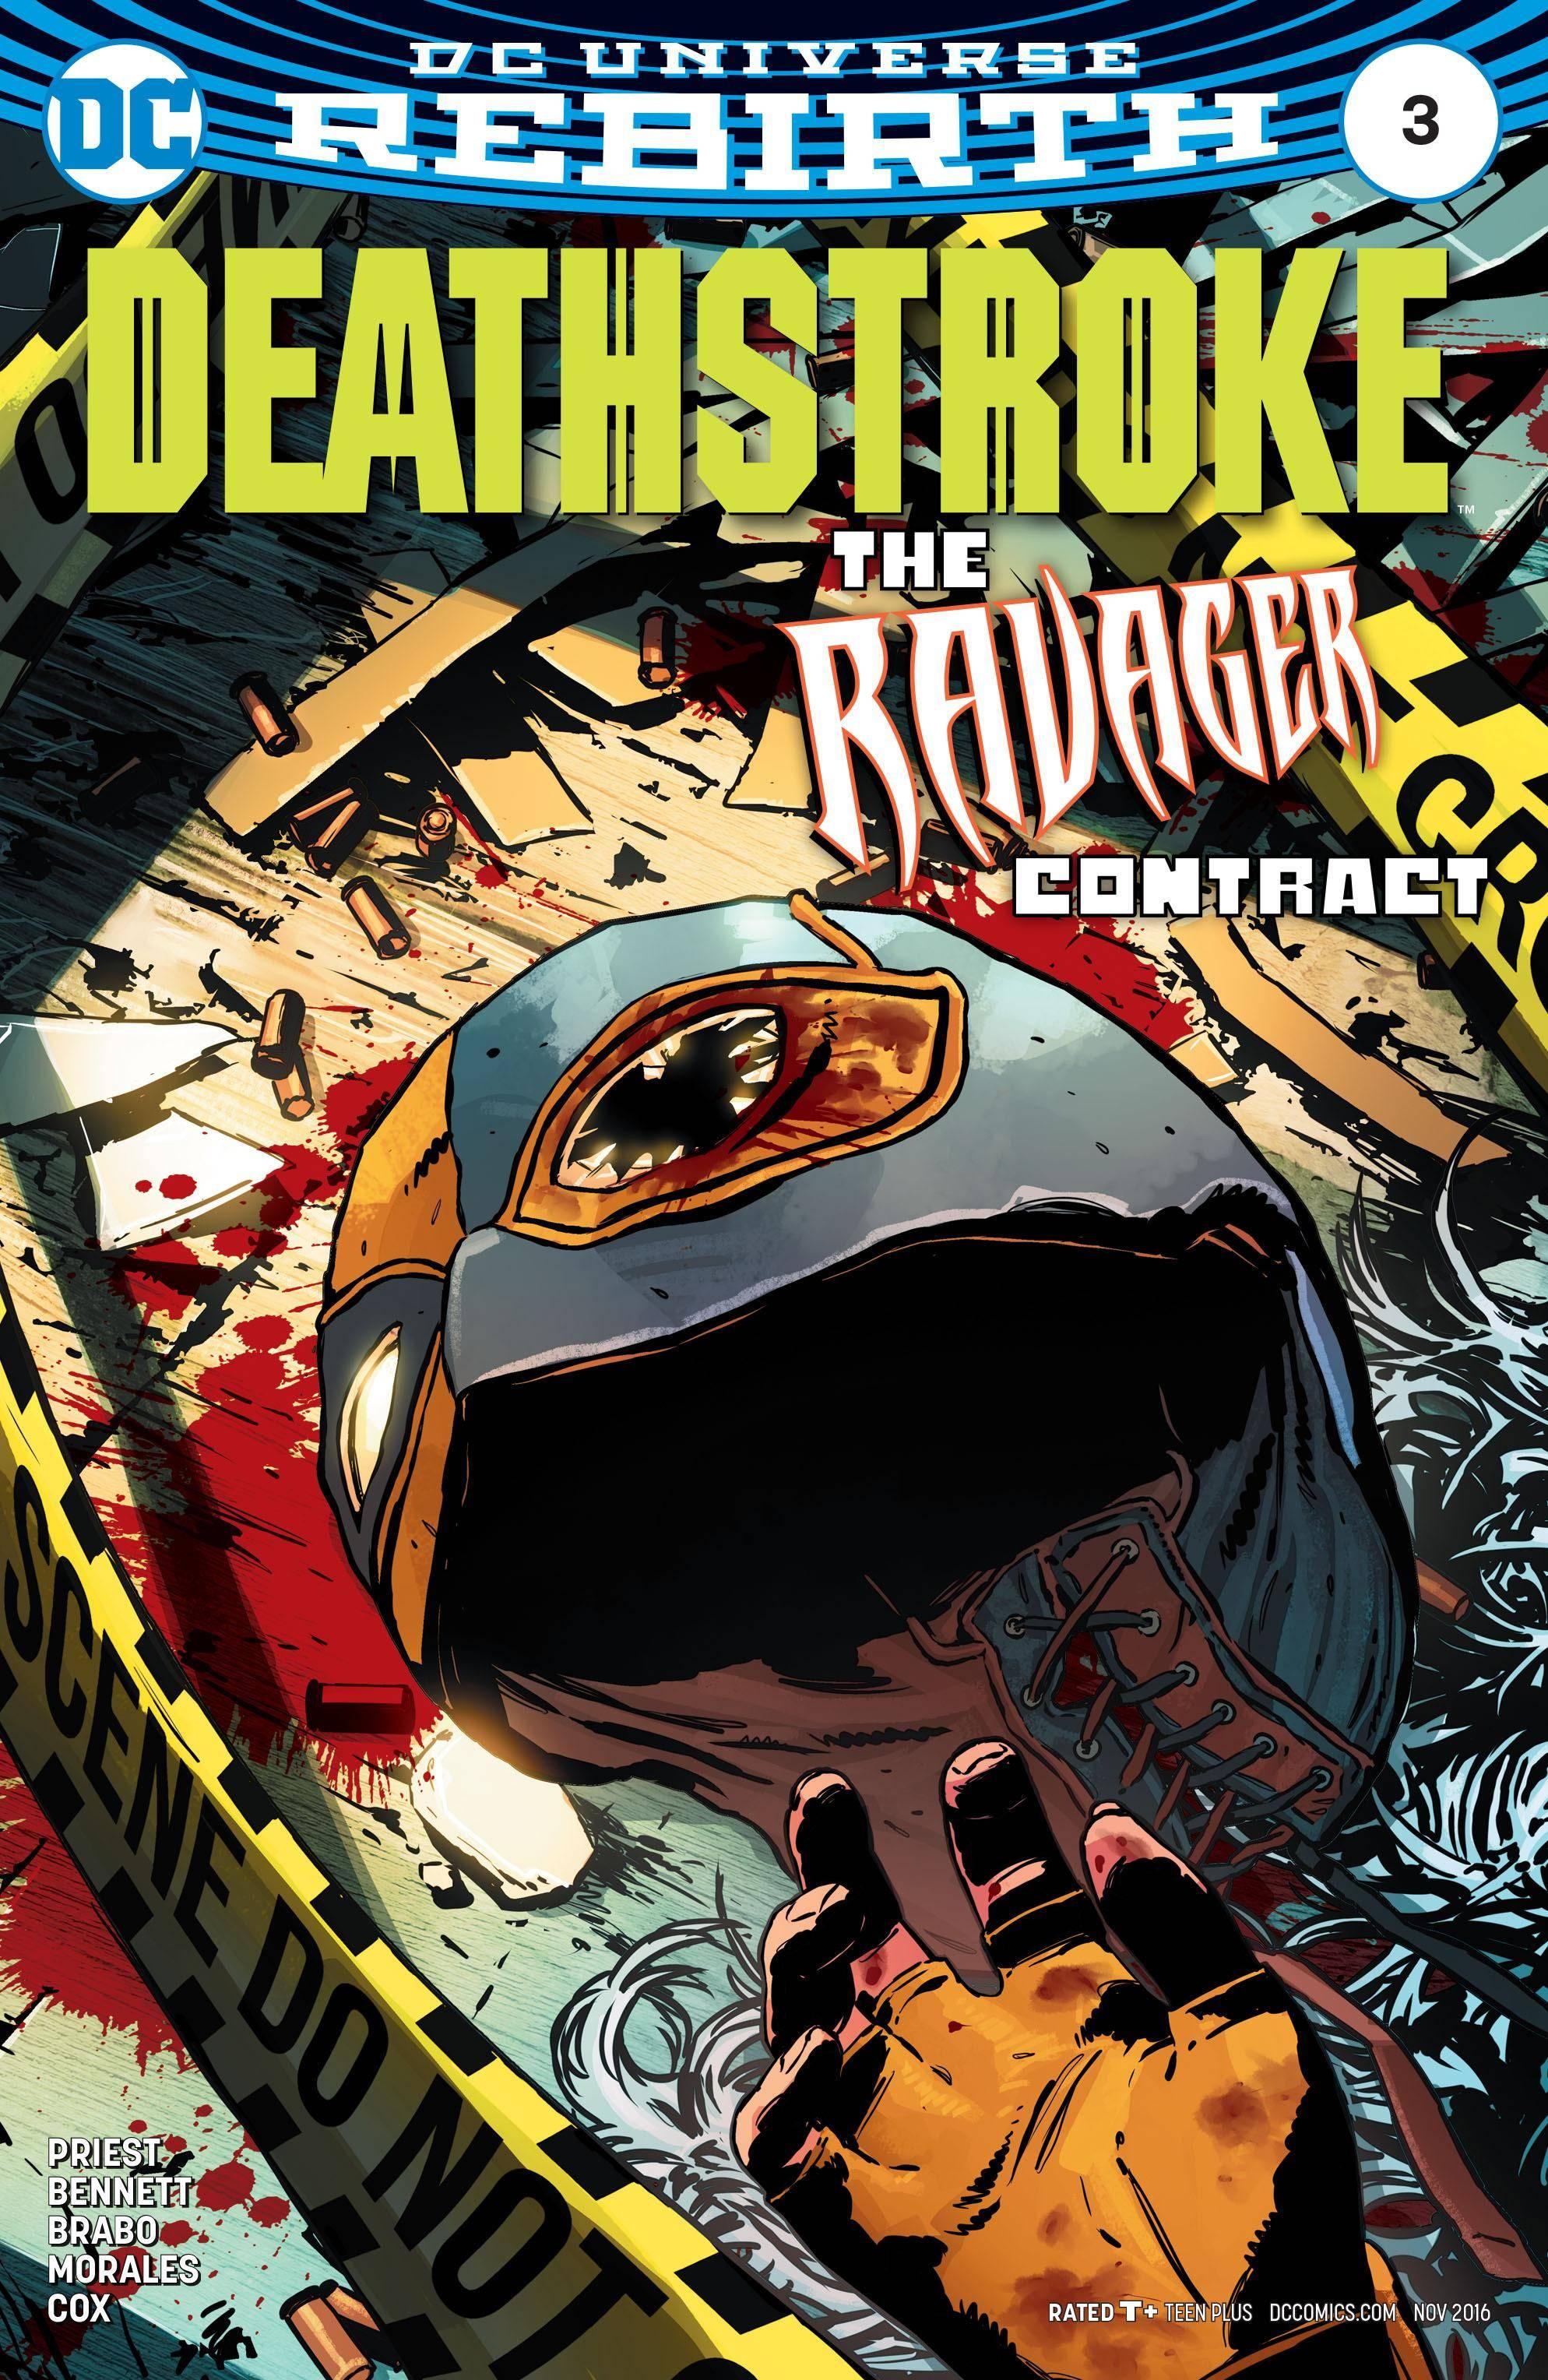 Deathstroke 003 2016 2 covers Digital Zone-Empire